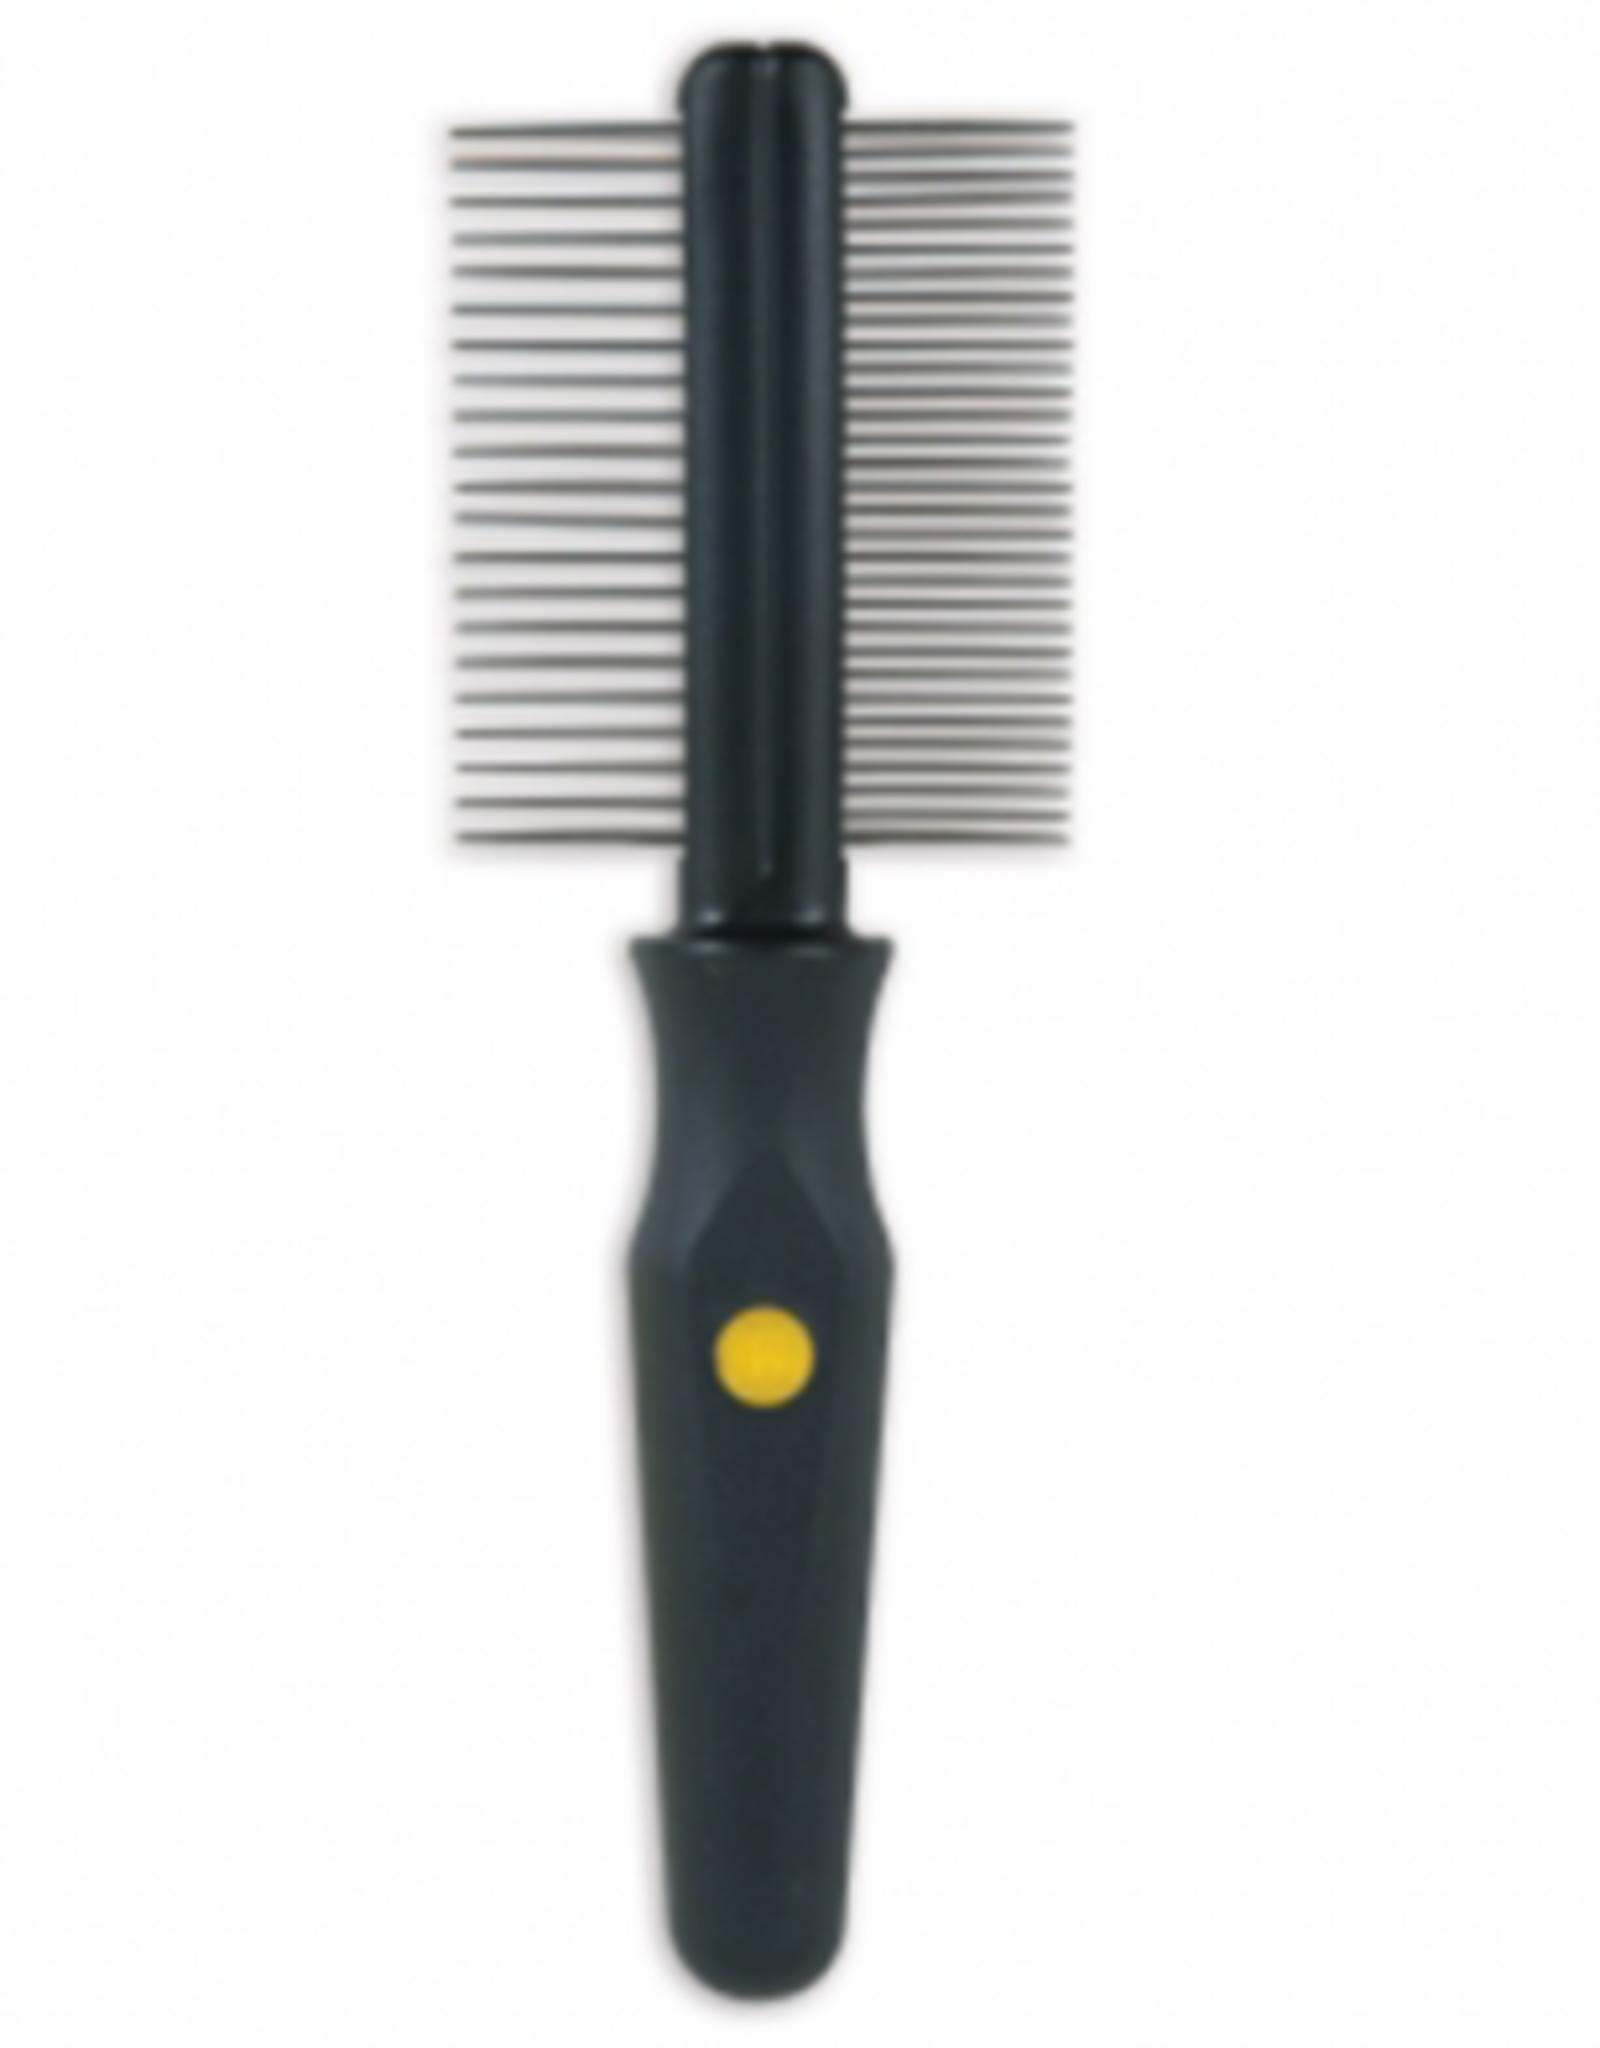 JW JW Gripsoft Double Sided Comb